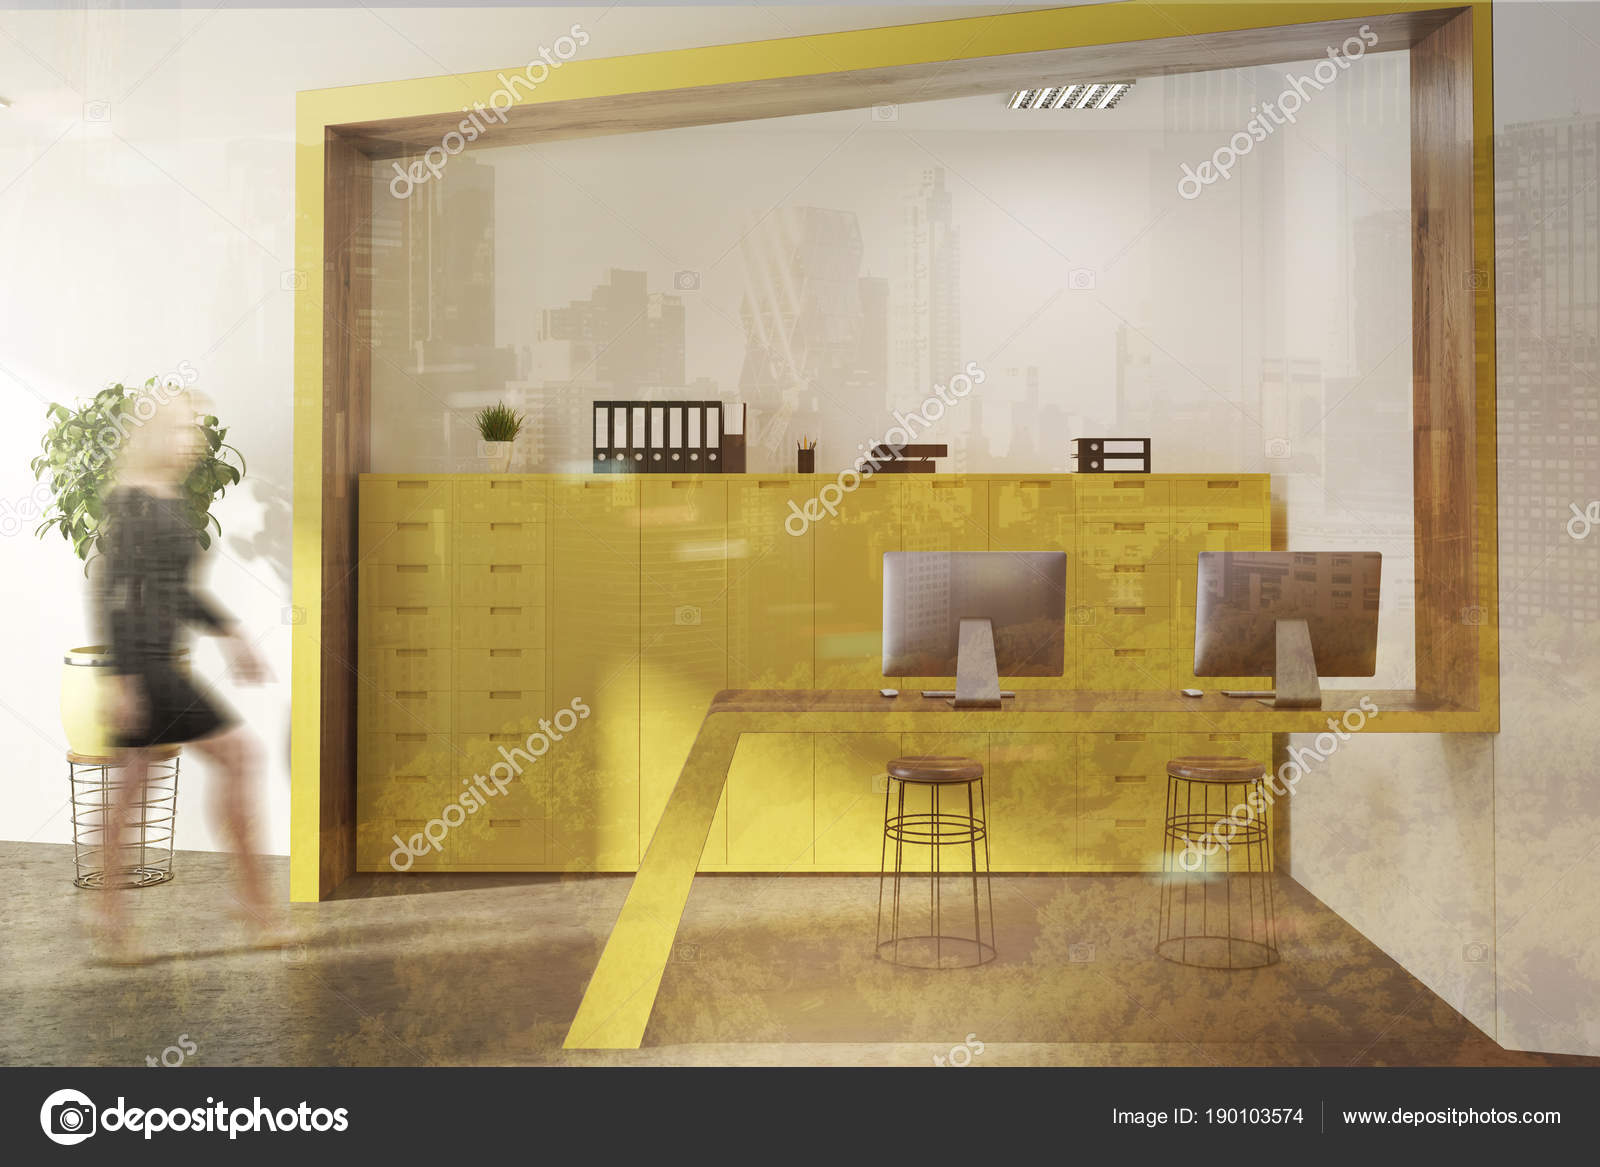 Accueil salle d attente de bureau jaune femme u photographie